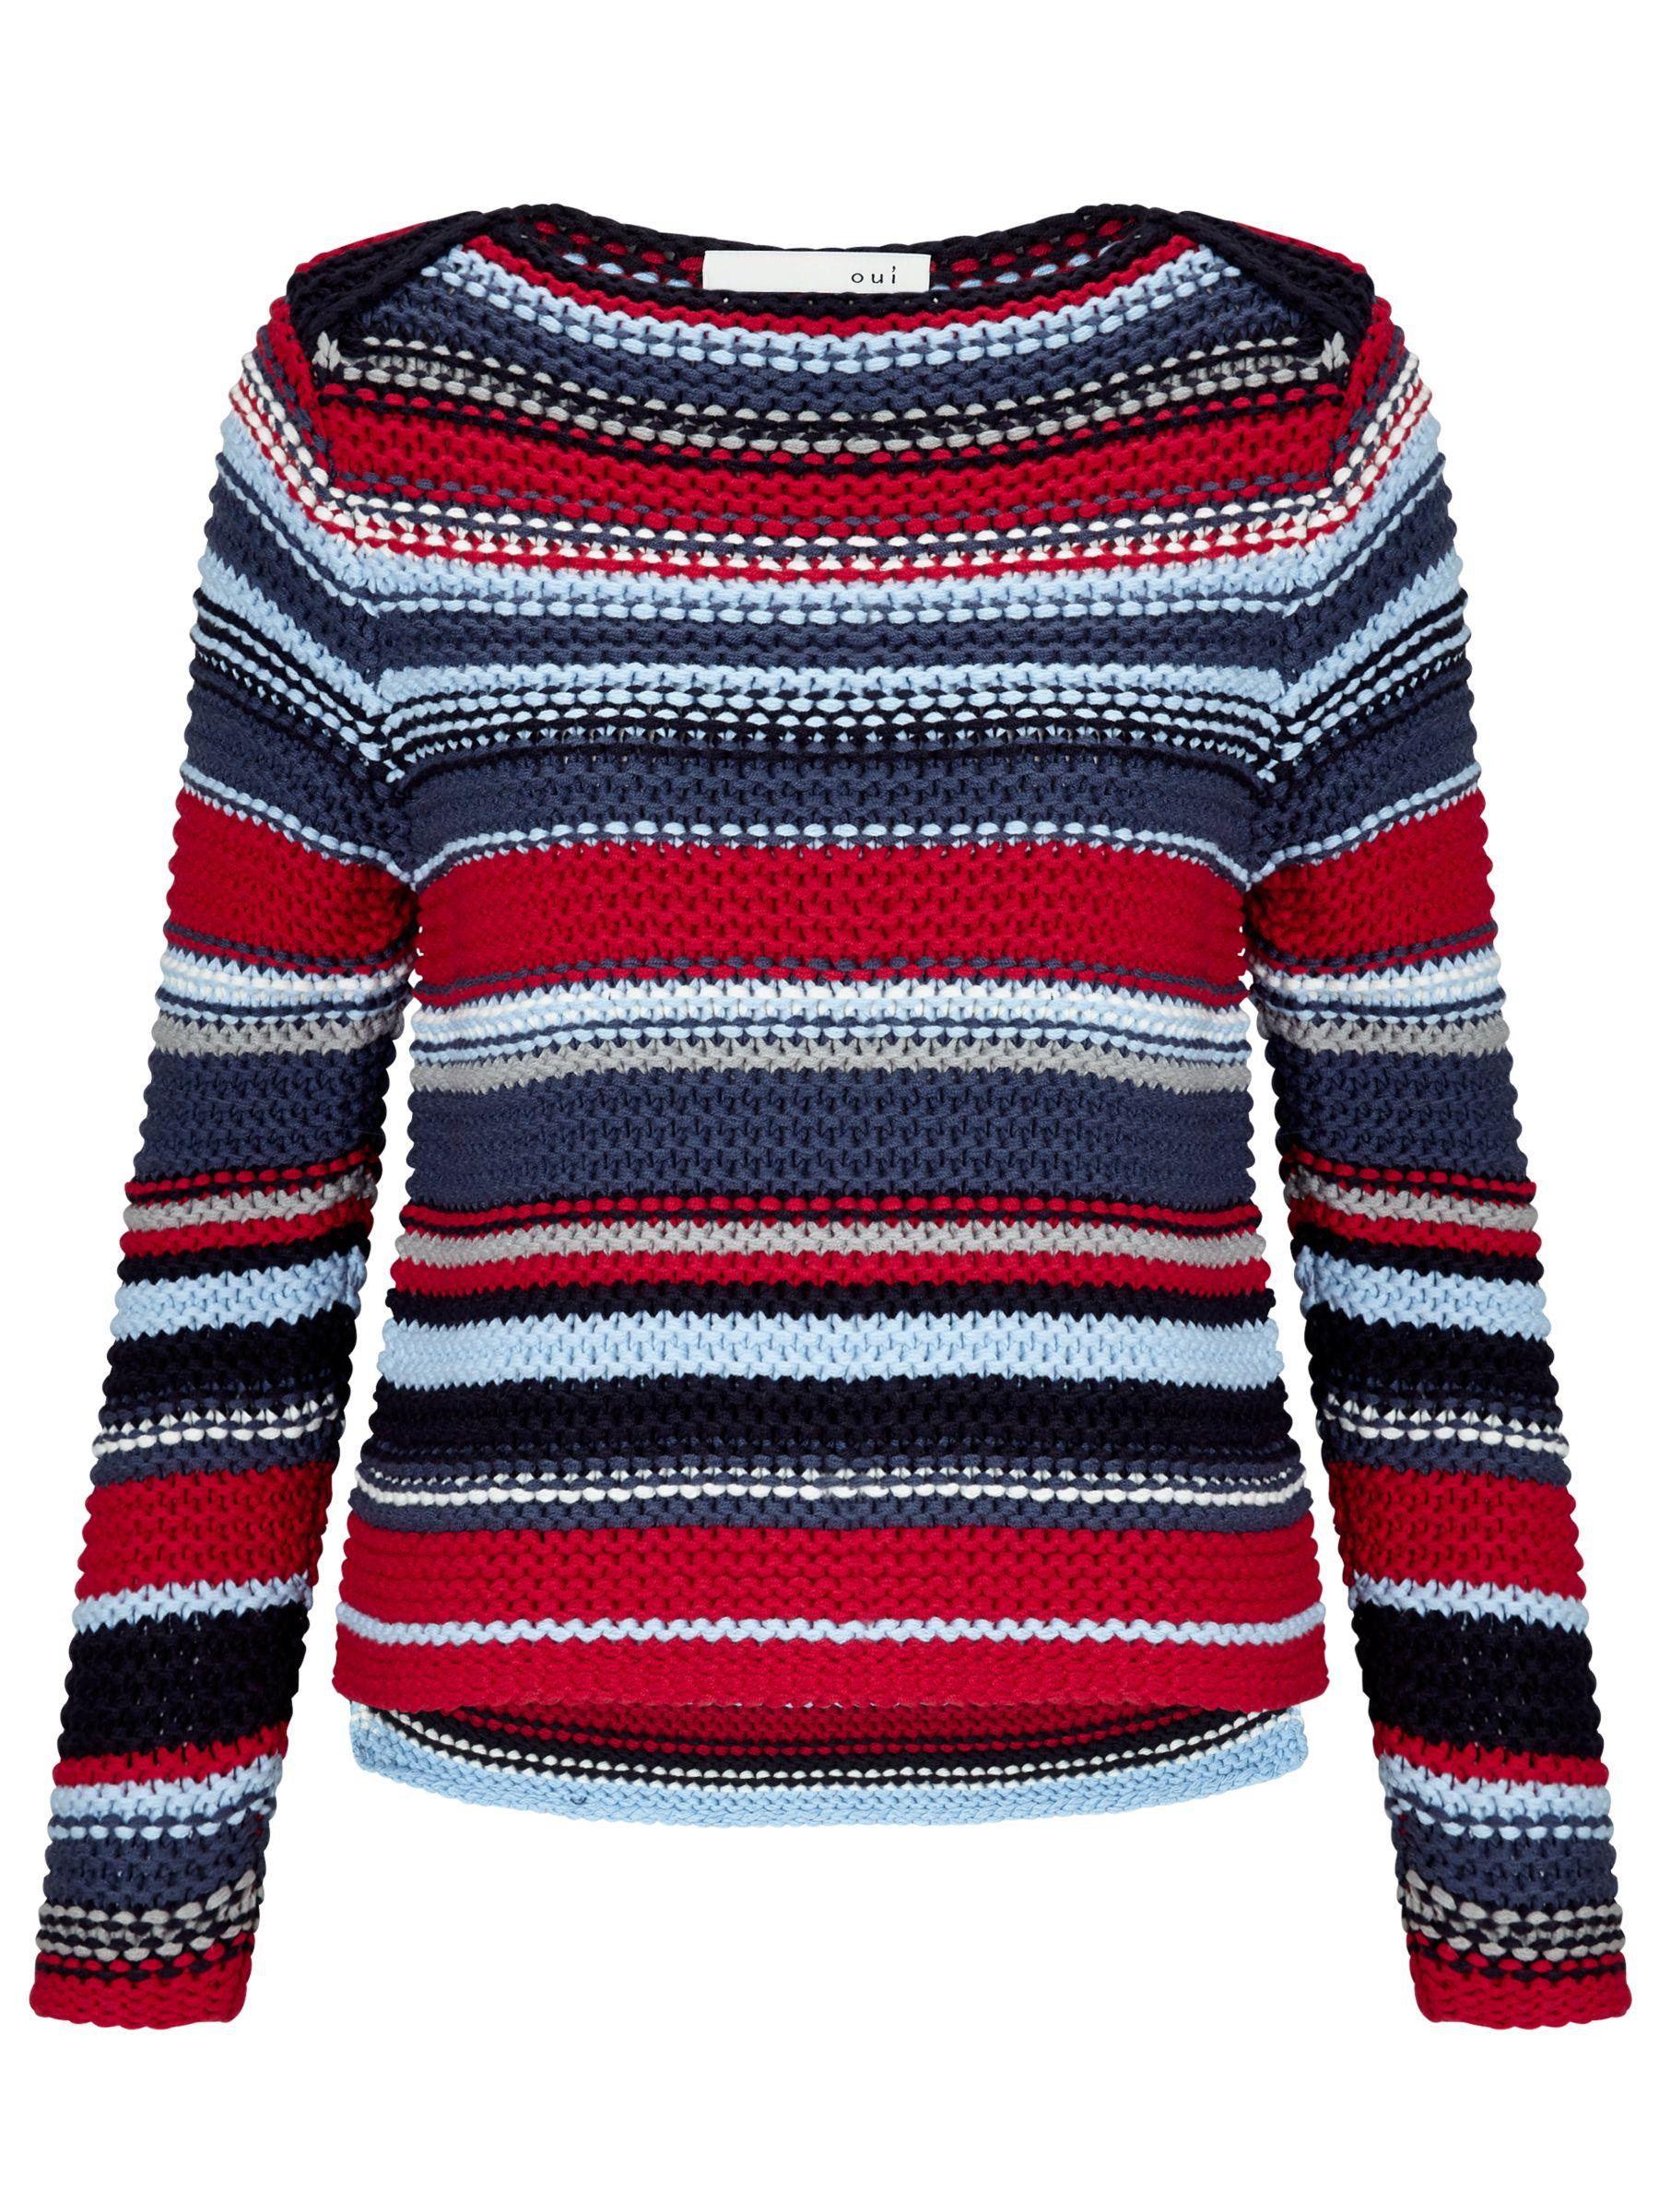 Oui Oui Chunky Knit Stripe Jumper, Red/Blue